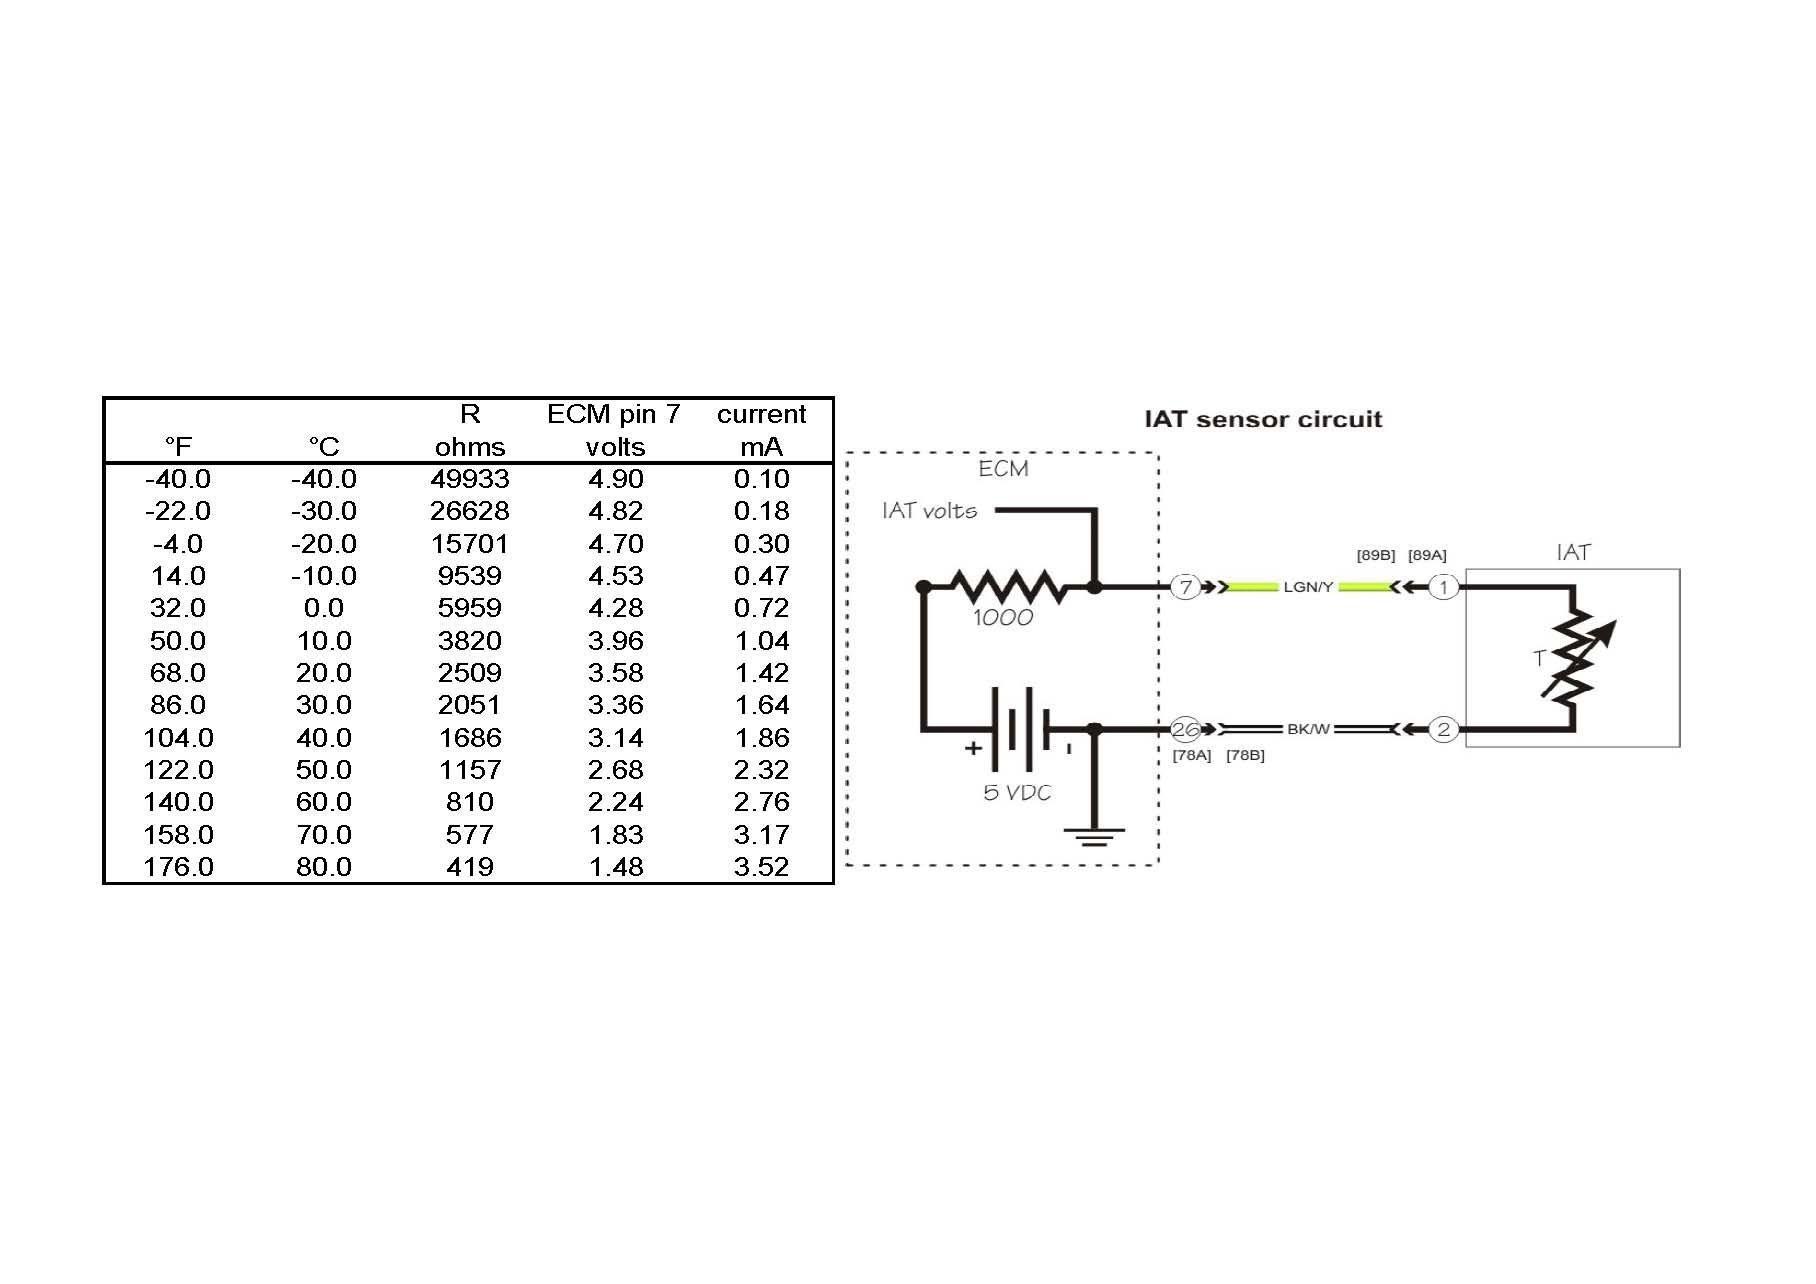 Harley Air Temp Sensor Wiring Diagram on harley engine temperature sensor 1996, harley-davidson heat sensor, harley cylinder head temperature,